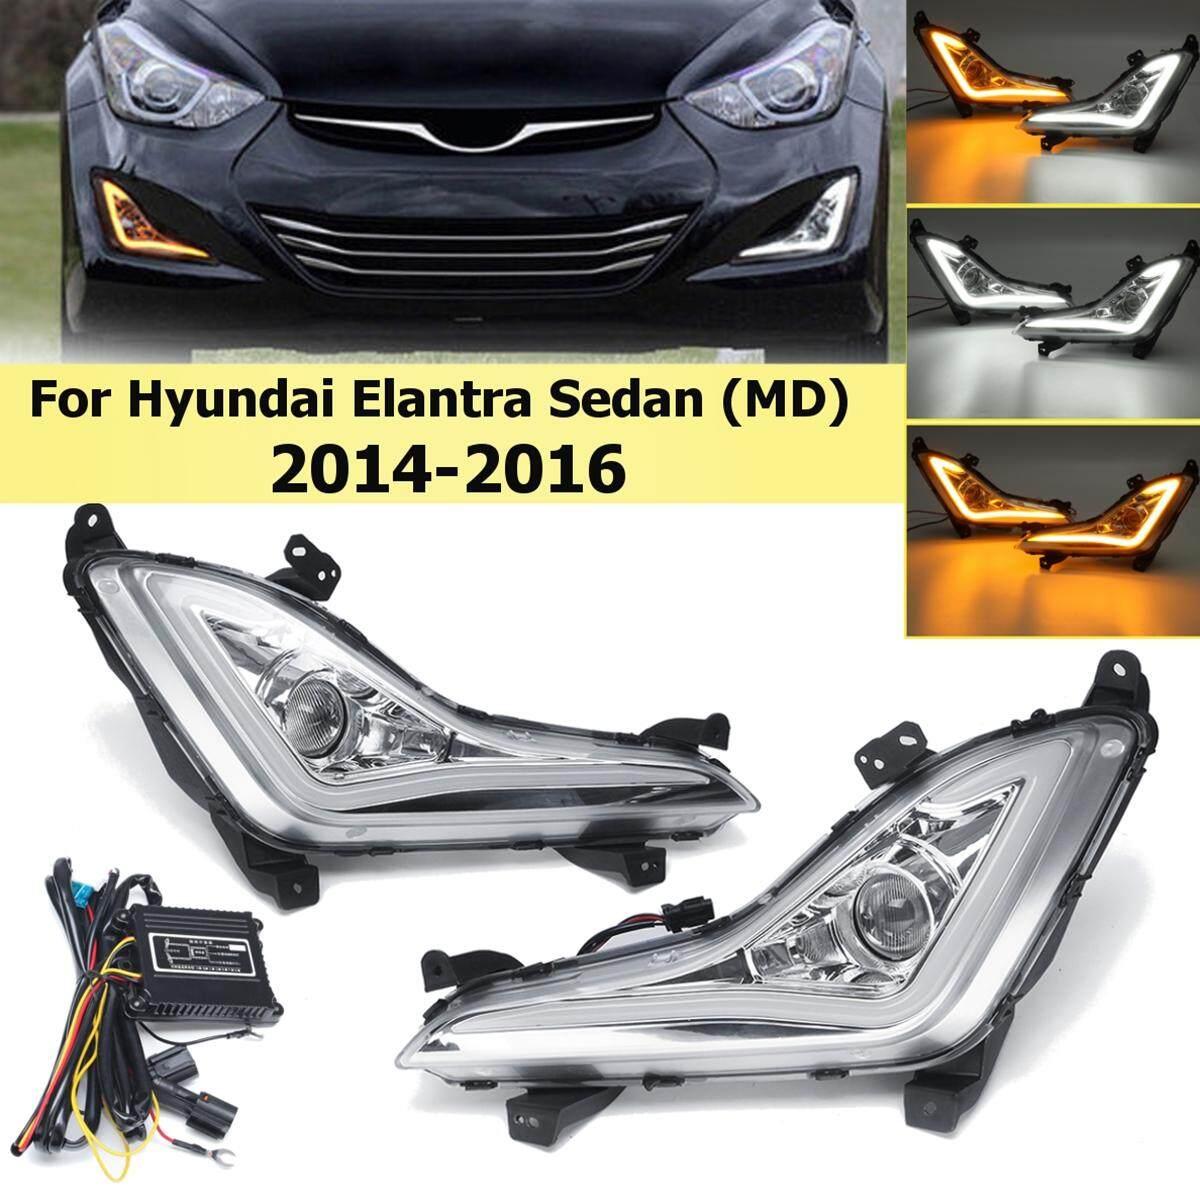 4 Pcs Set Car Window Sun Shade Shield Blind Mesh For Hyundai Accent Sd 2010-2016